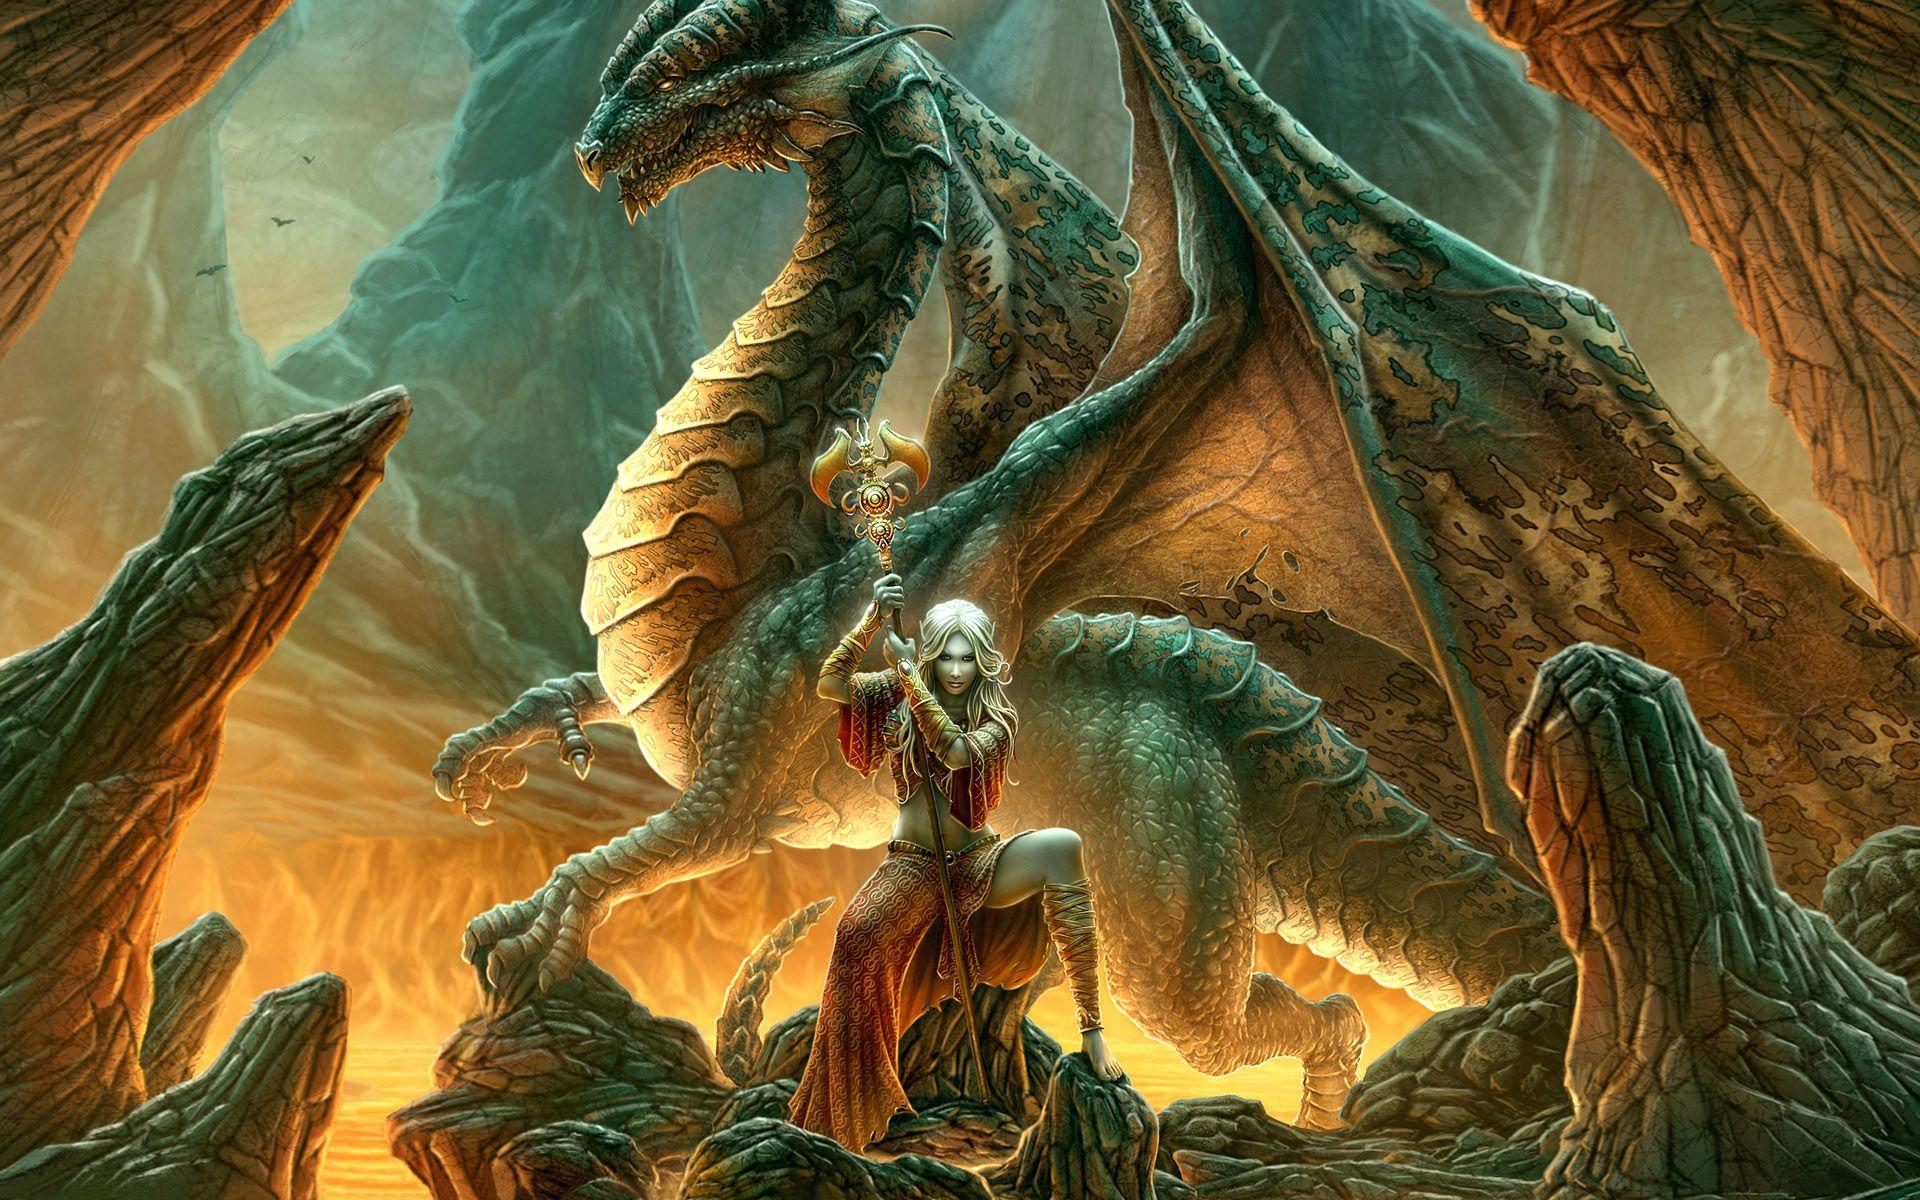 Fantasy Dragons And Women Fantasy Desktop Backgrounds Dragon Wallpaper Dragon With Girl Fantasy Dragon Dragon Artwork Dragon Pictures